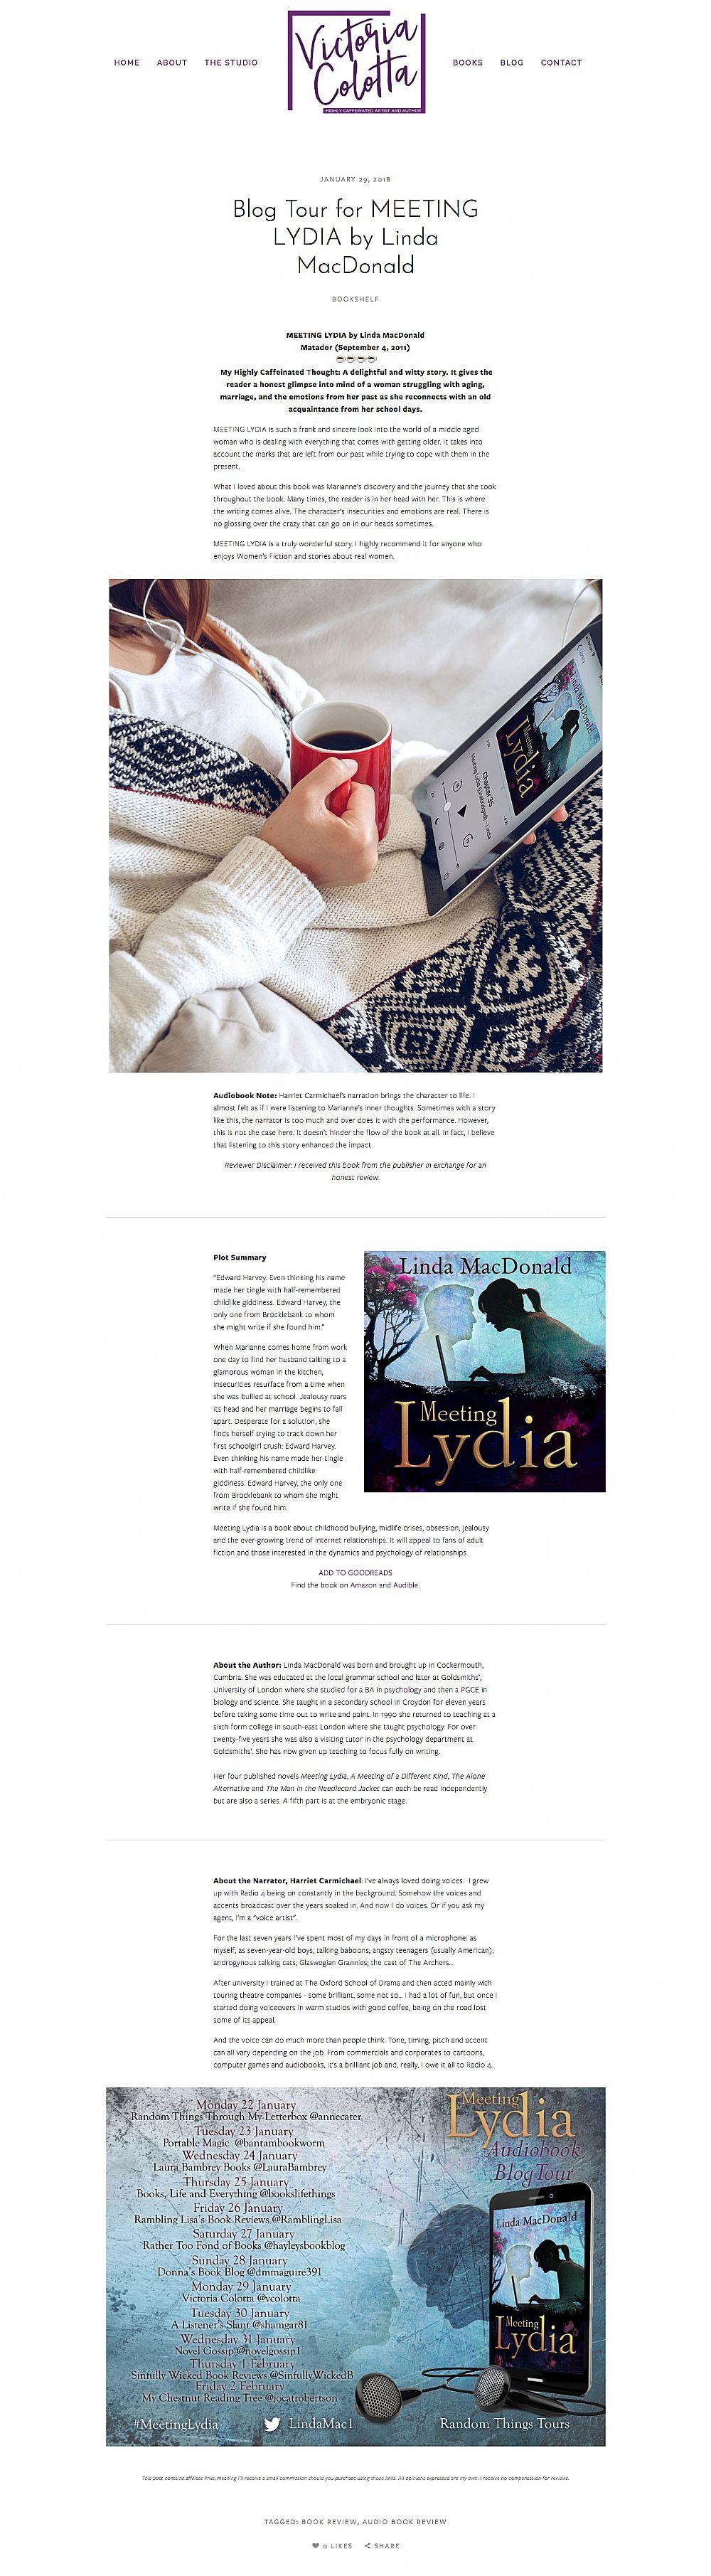 creative writing help blogs 2017